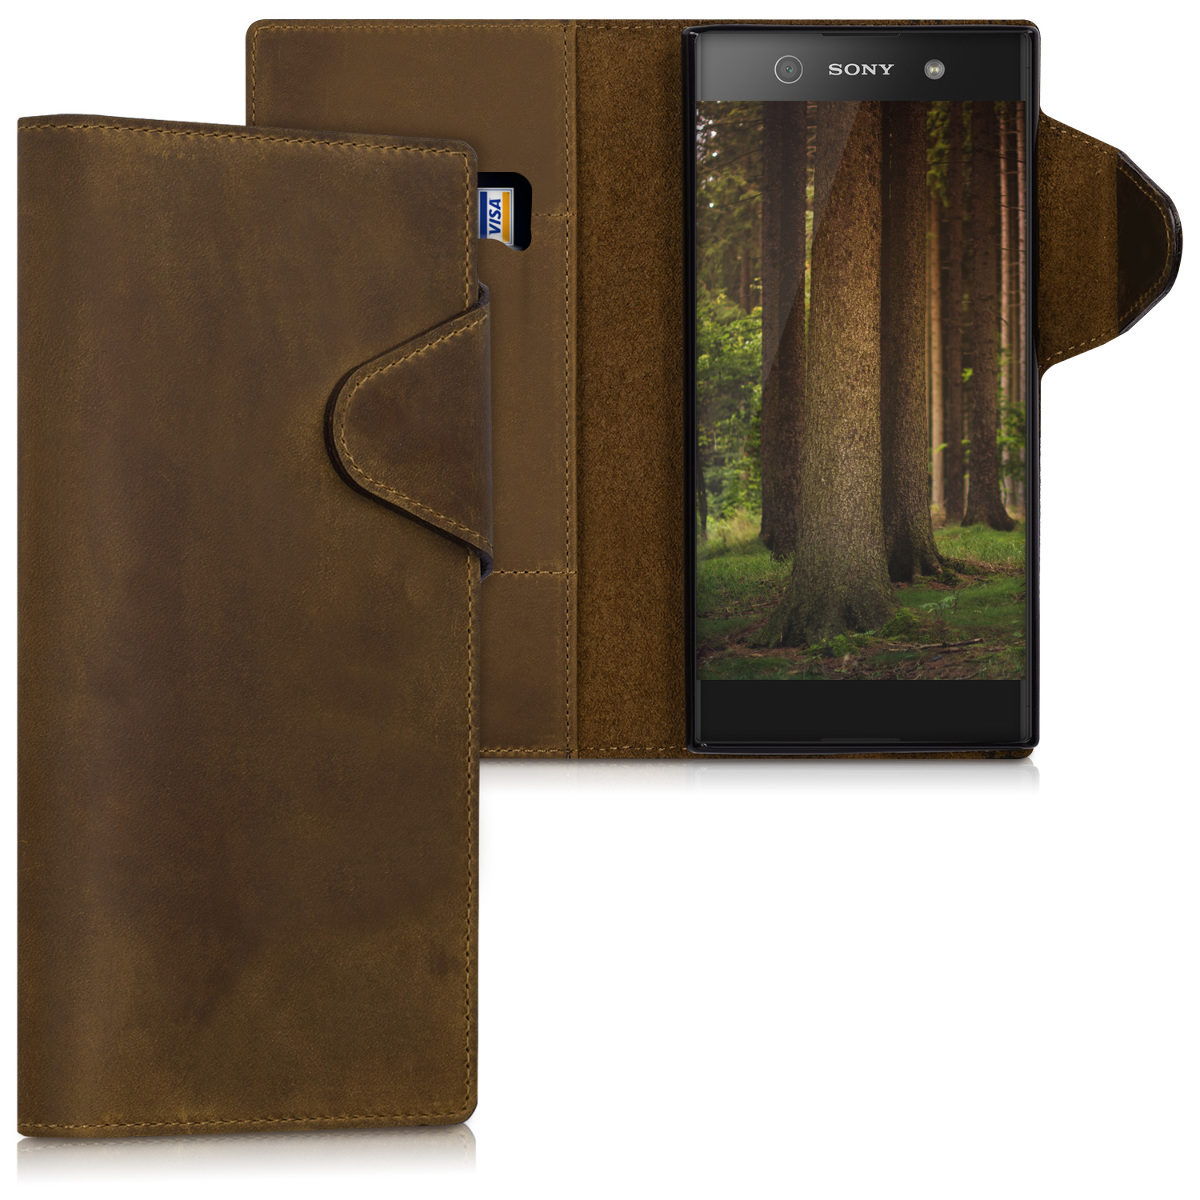 Kalibri Δερμάτινη Suede Θήκη - Πορτοφόλι Sony Xperia XA1 Ultra - Brown (43450.05)